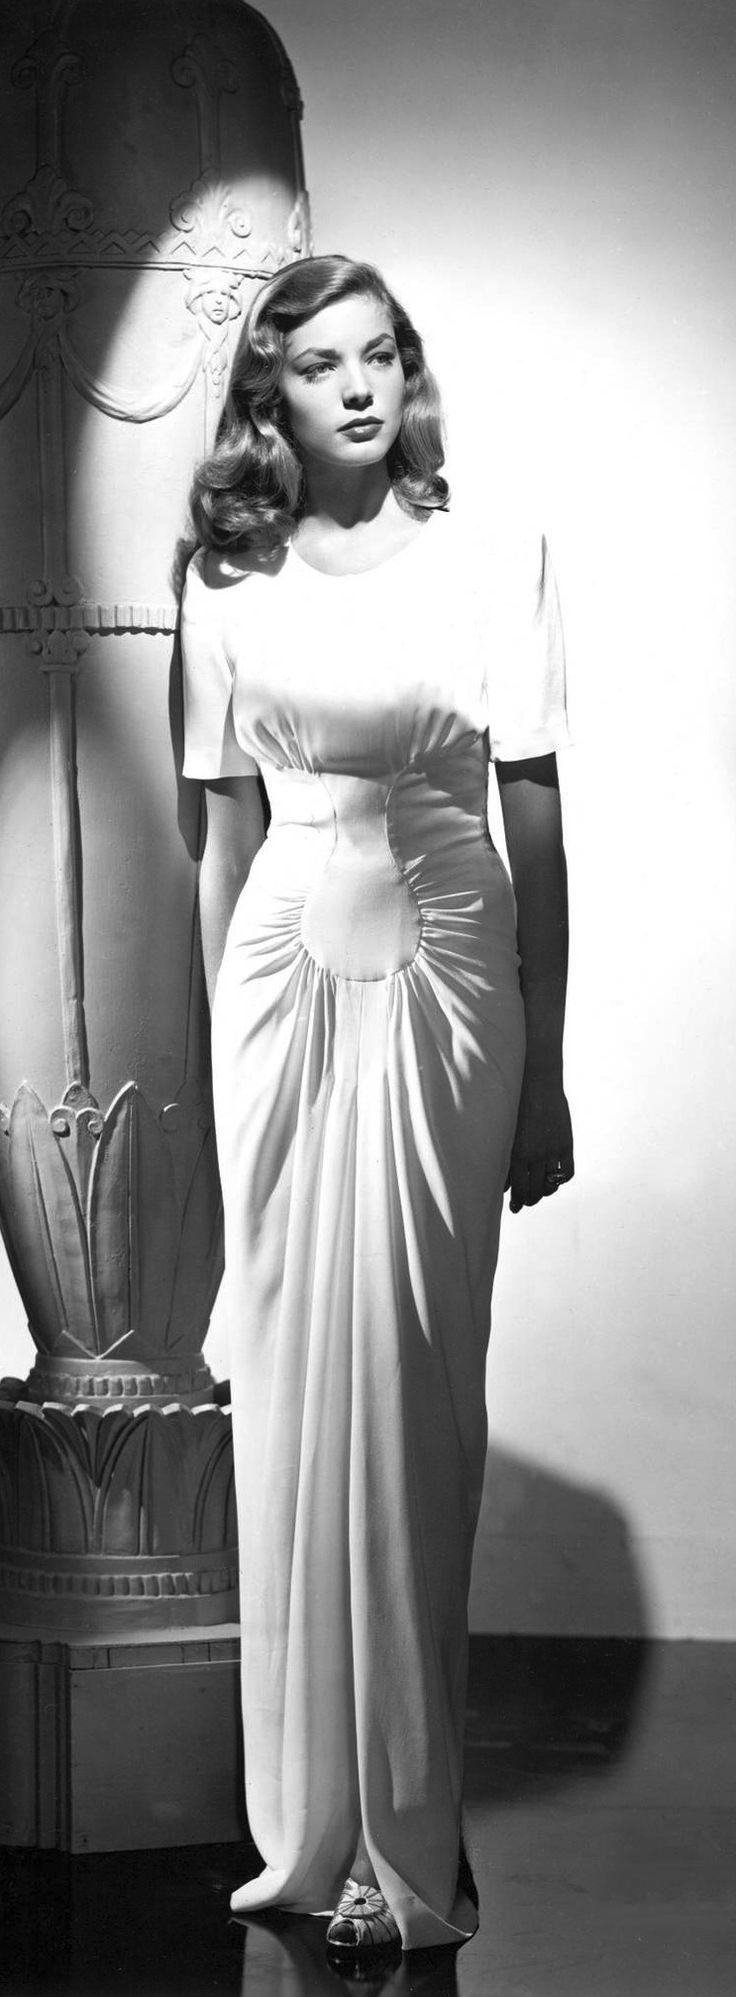 Lauren Bacall, beautiful!